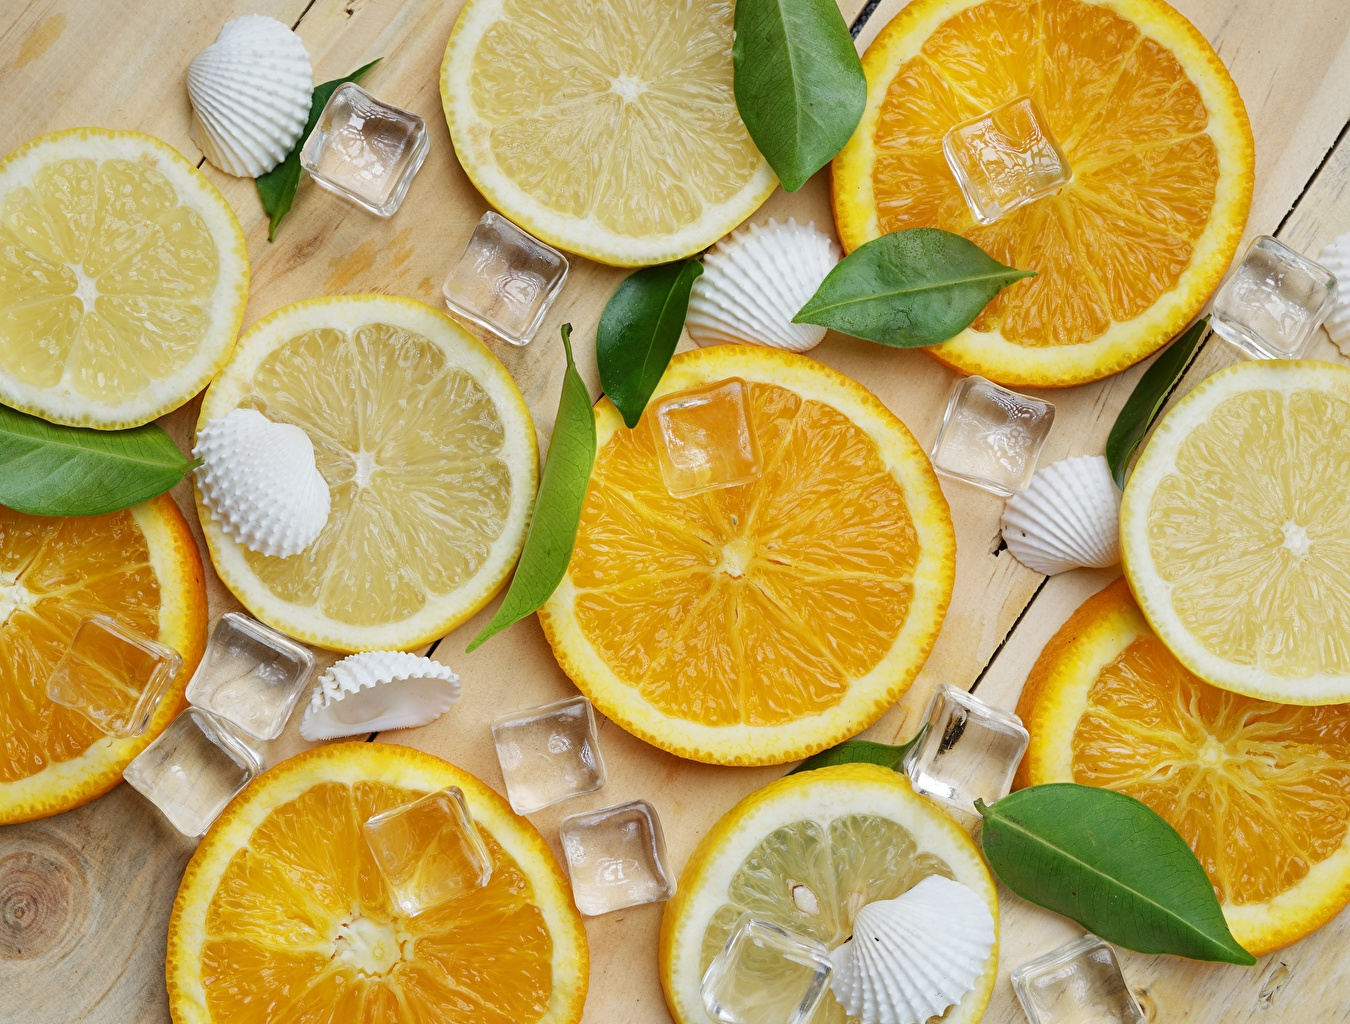 Картинки Текстура льда Апельсин Ракушки Продукты питания Лед Еда Пища